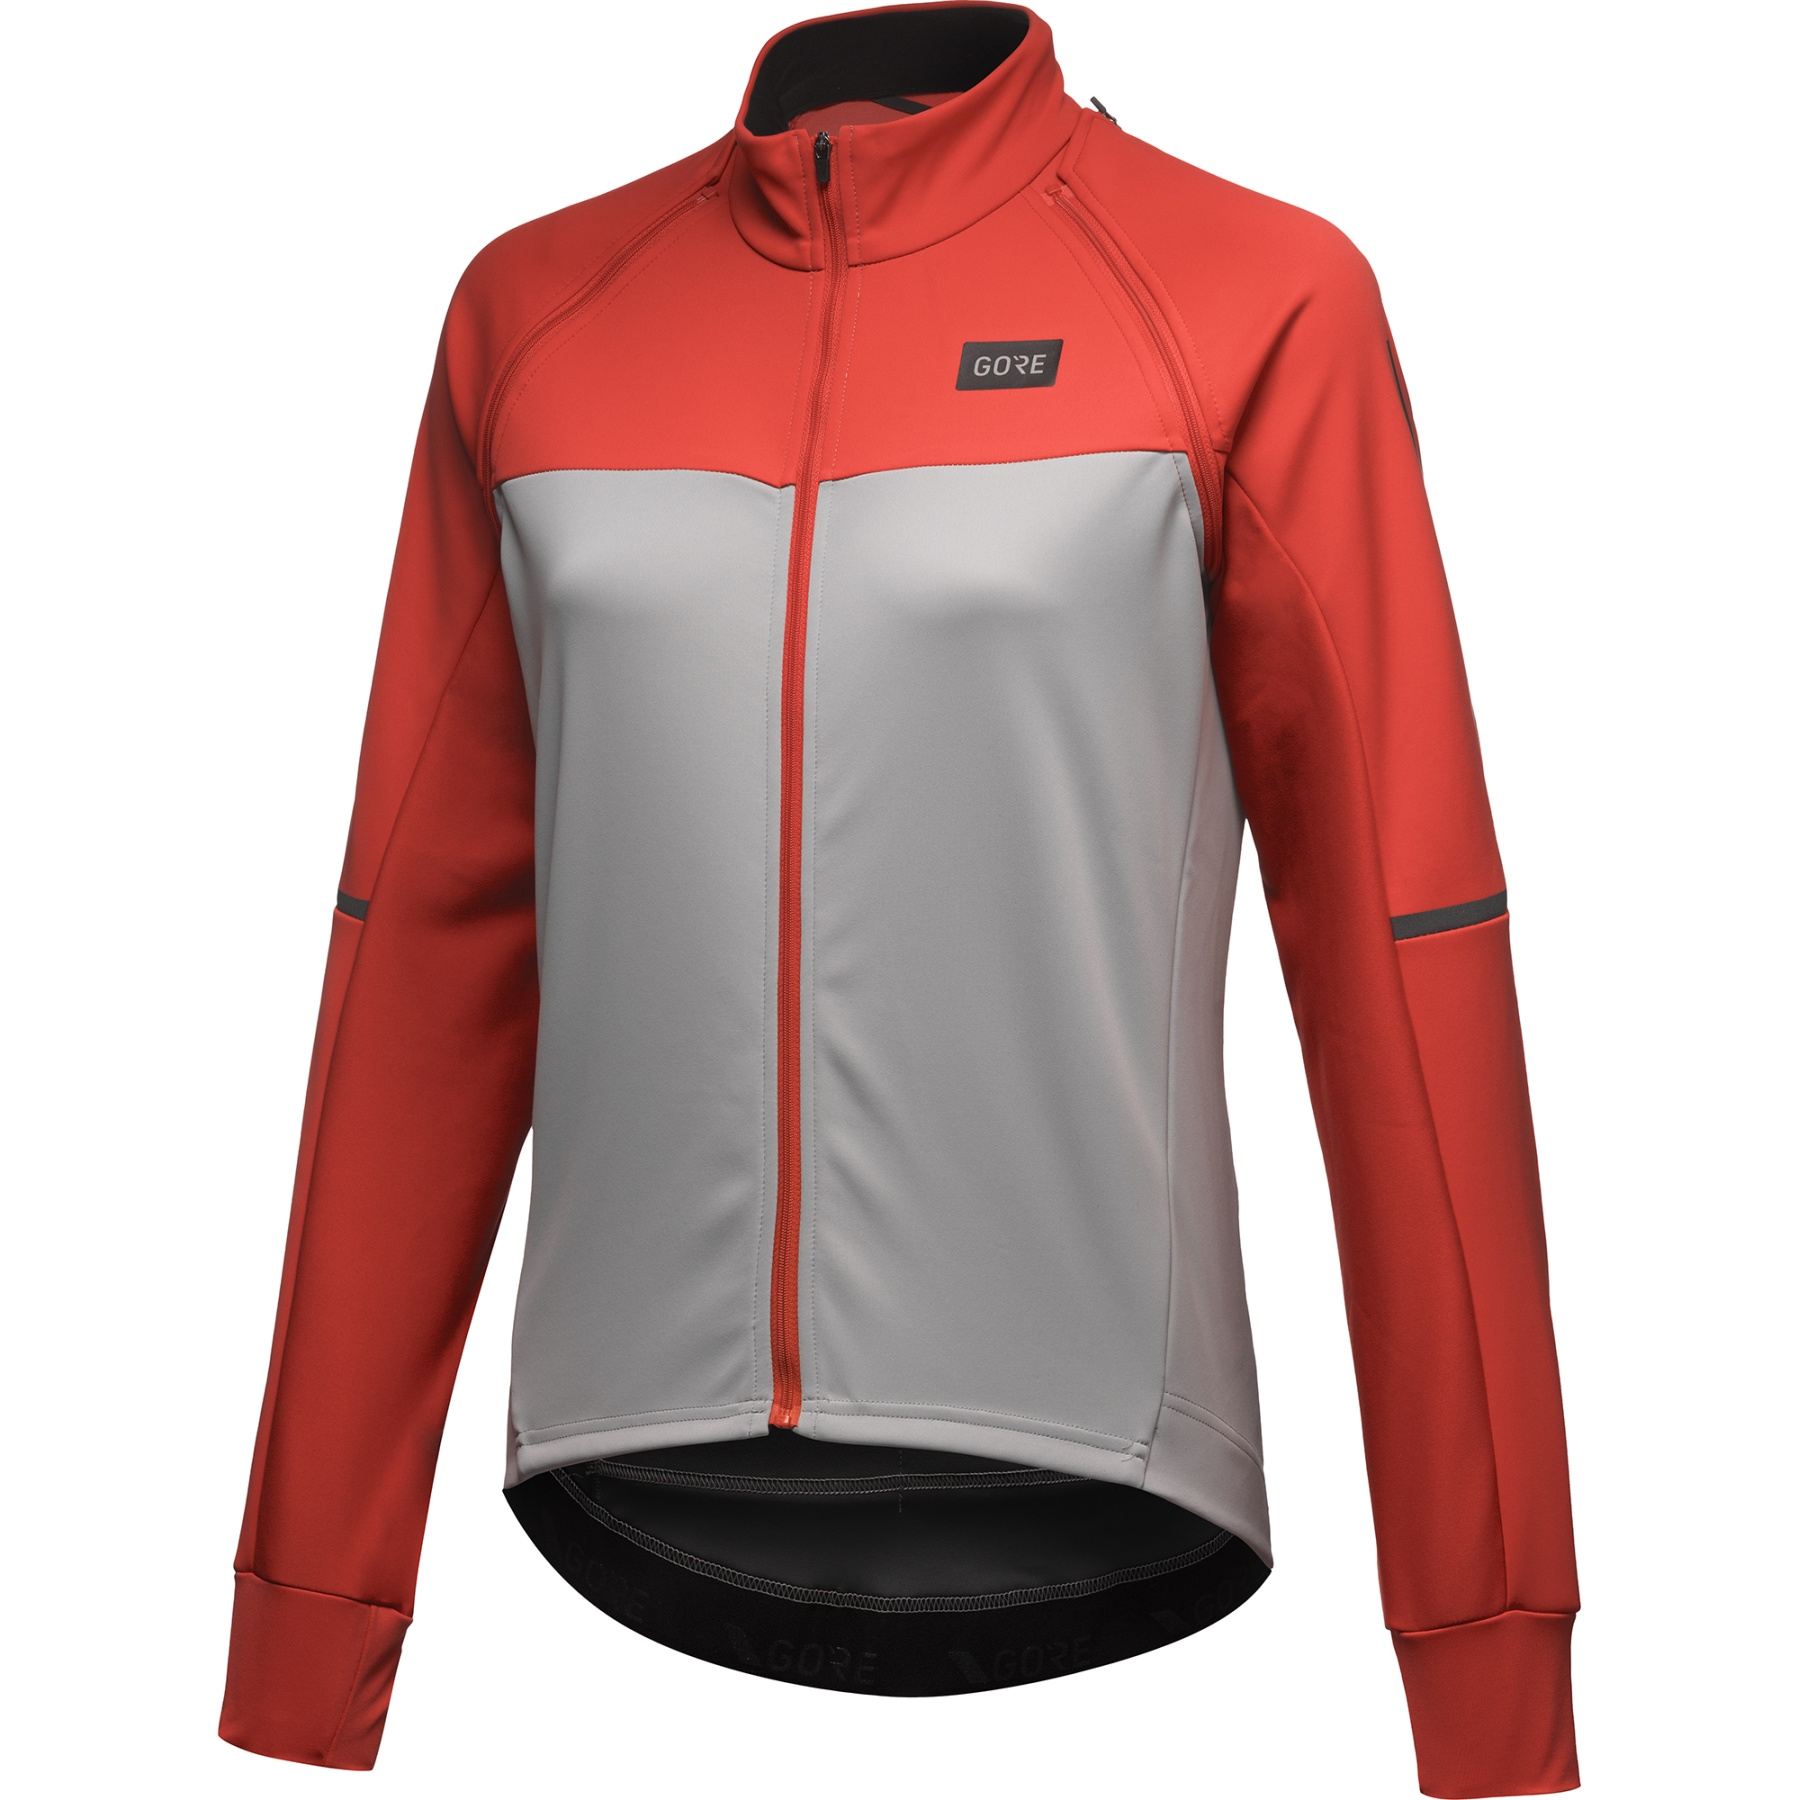 Image of GORE Wear Phantom Jacket for Women - lab grey/fireball BFAY